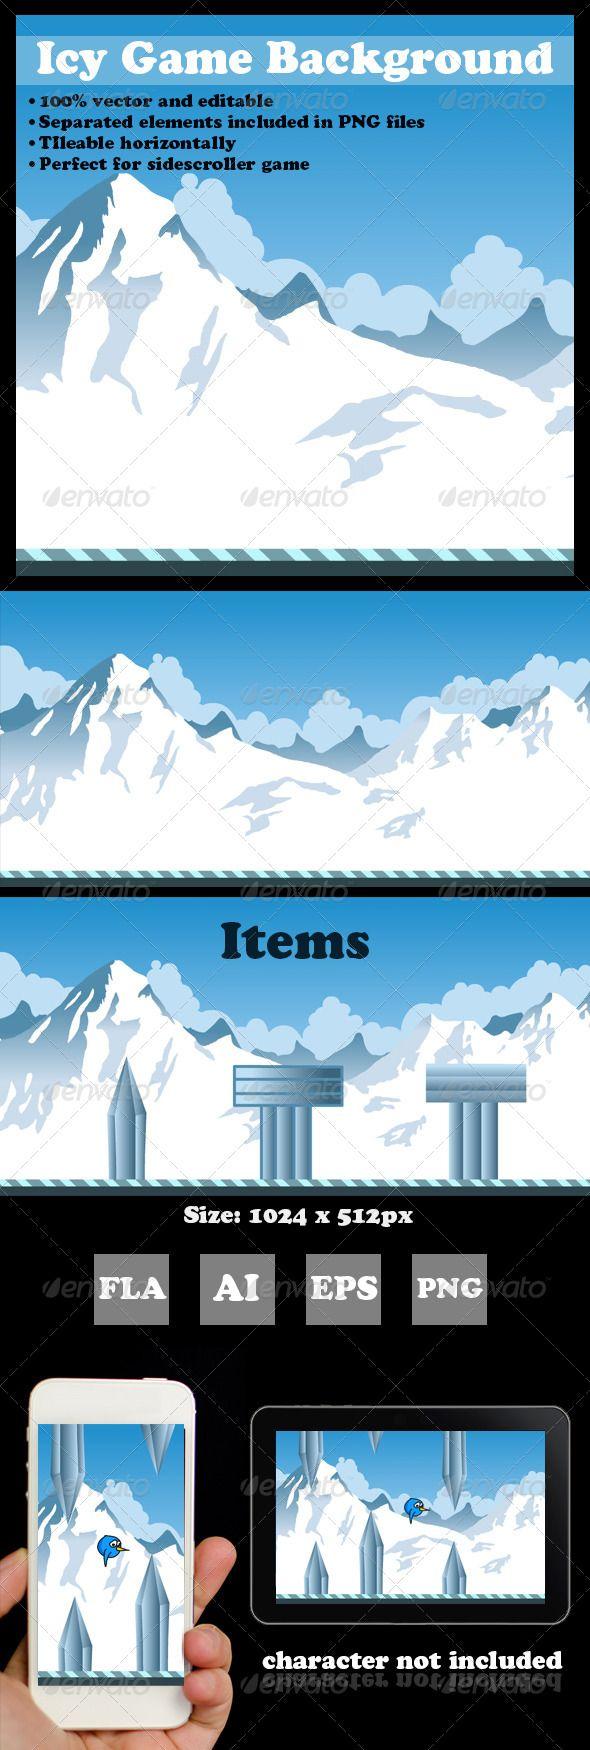 Icy Game Background Game background, Game assets, Pixel